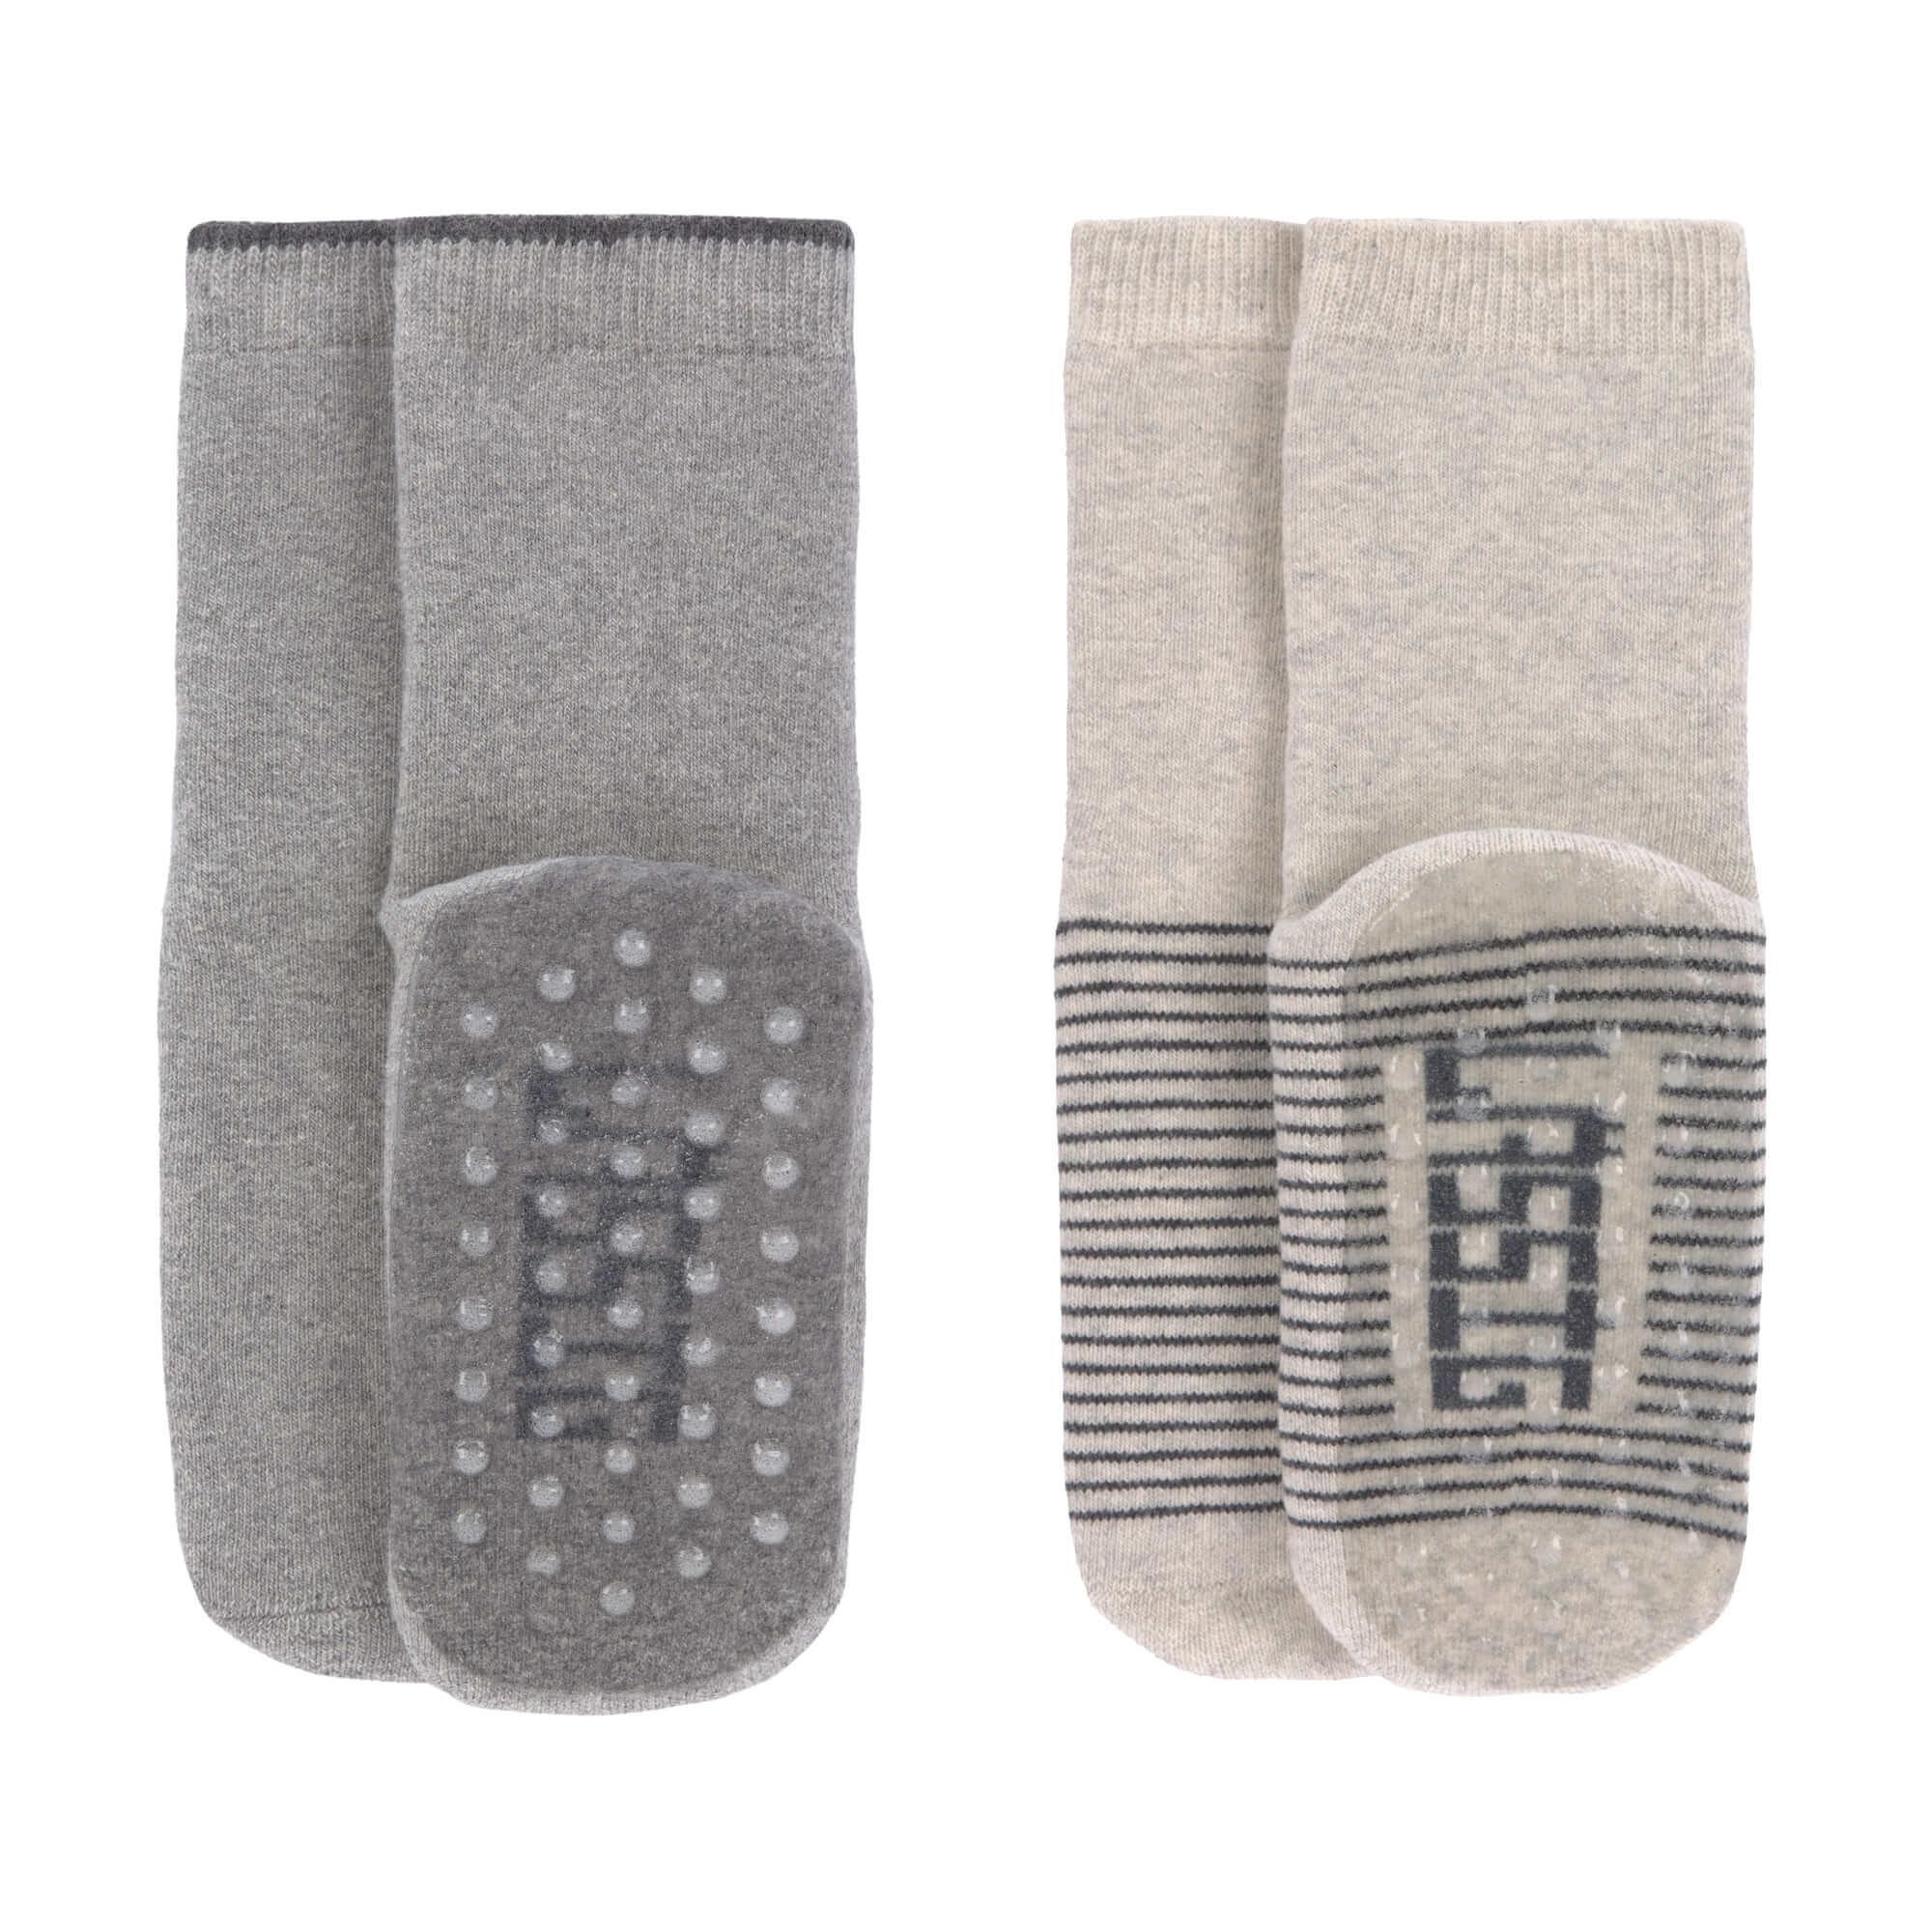 Lassig - Anti-slip Socks 2 pcs. assorted grey/beige, Size: 15-18